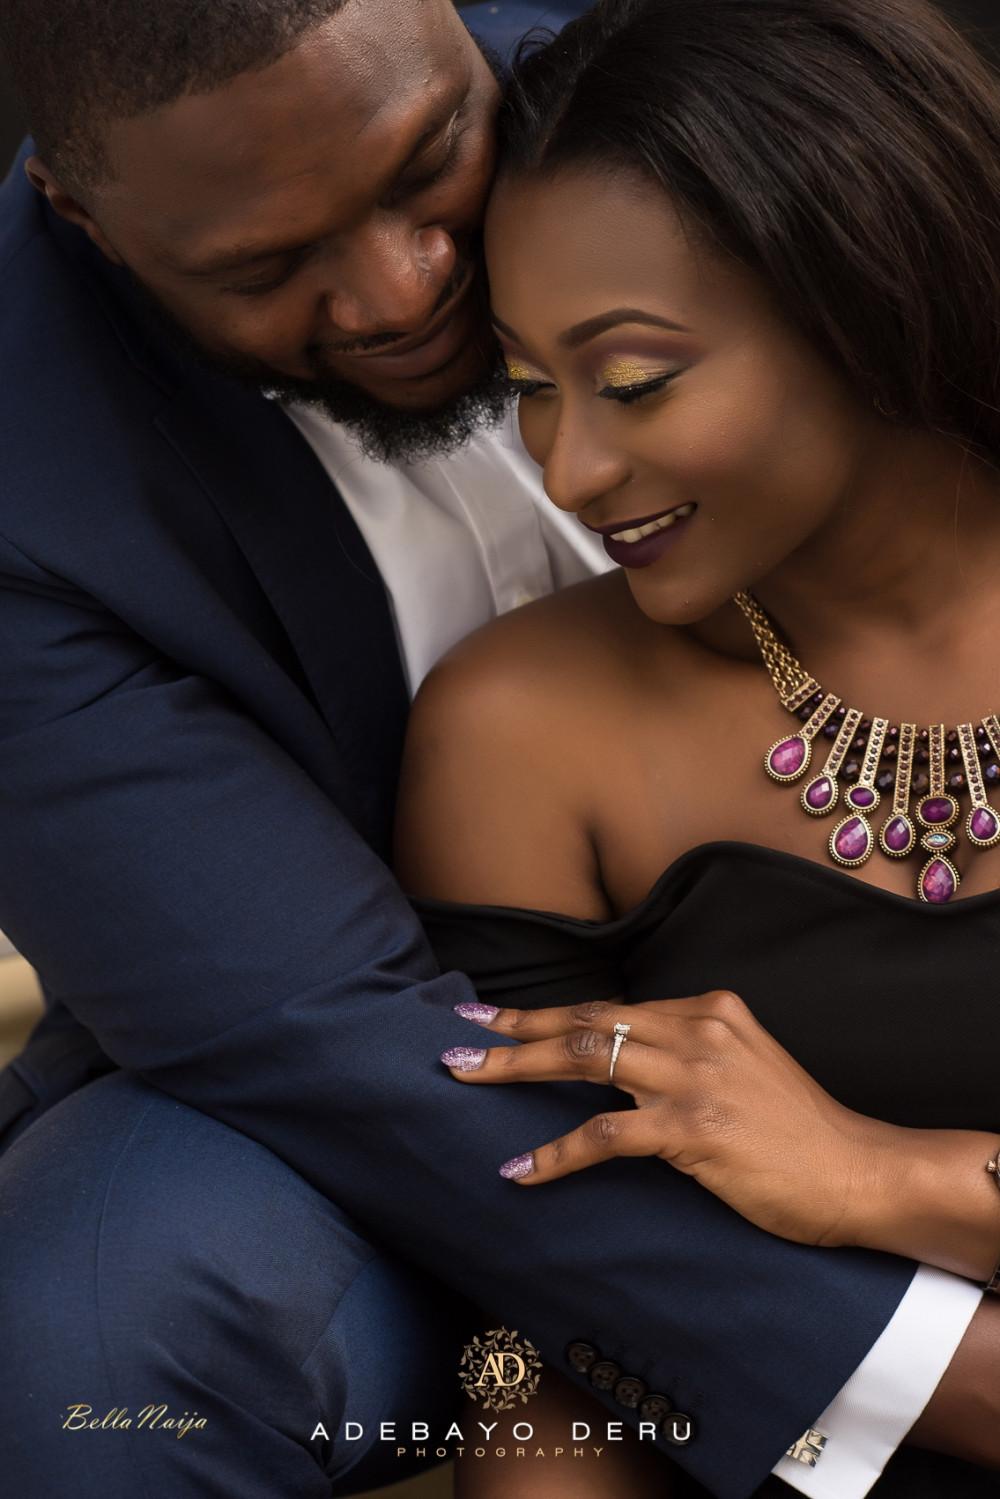 DTunes2015_Dunni and Babatunde_Adebayo Deru_Pre Wedding Shoot_Dunni_Babatunde-73